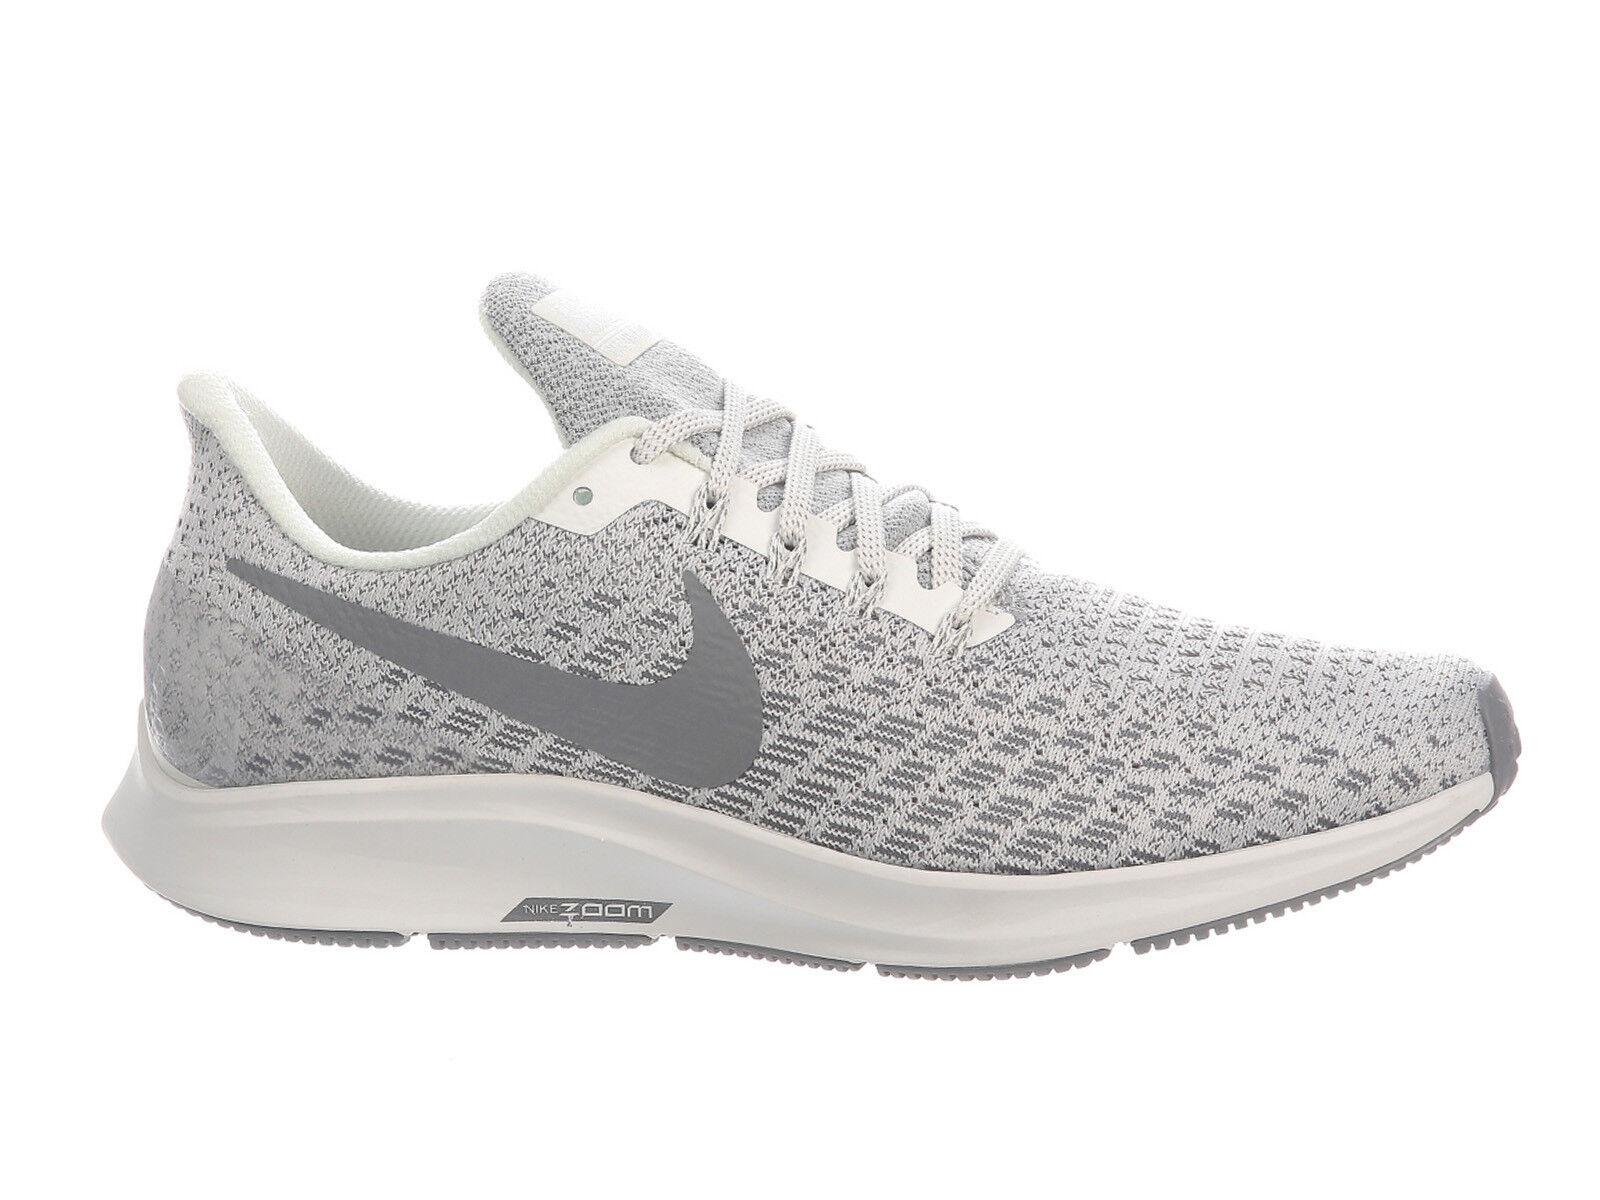 Womens Nike Air Zoom Pegasus 35 Running Shoes Trainers Phantom/Gunsmoke/Summit